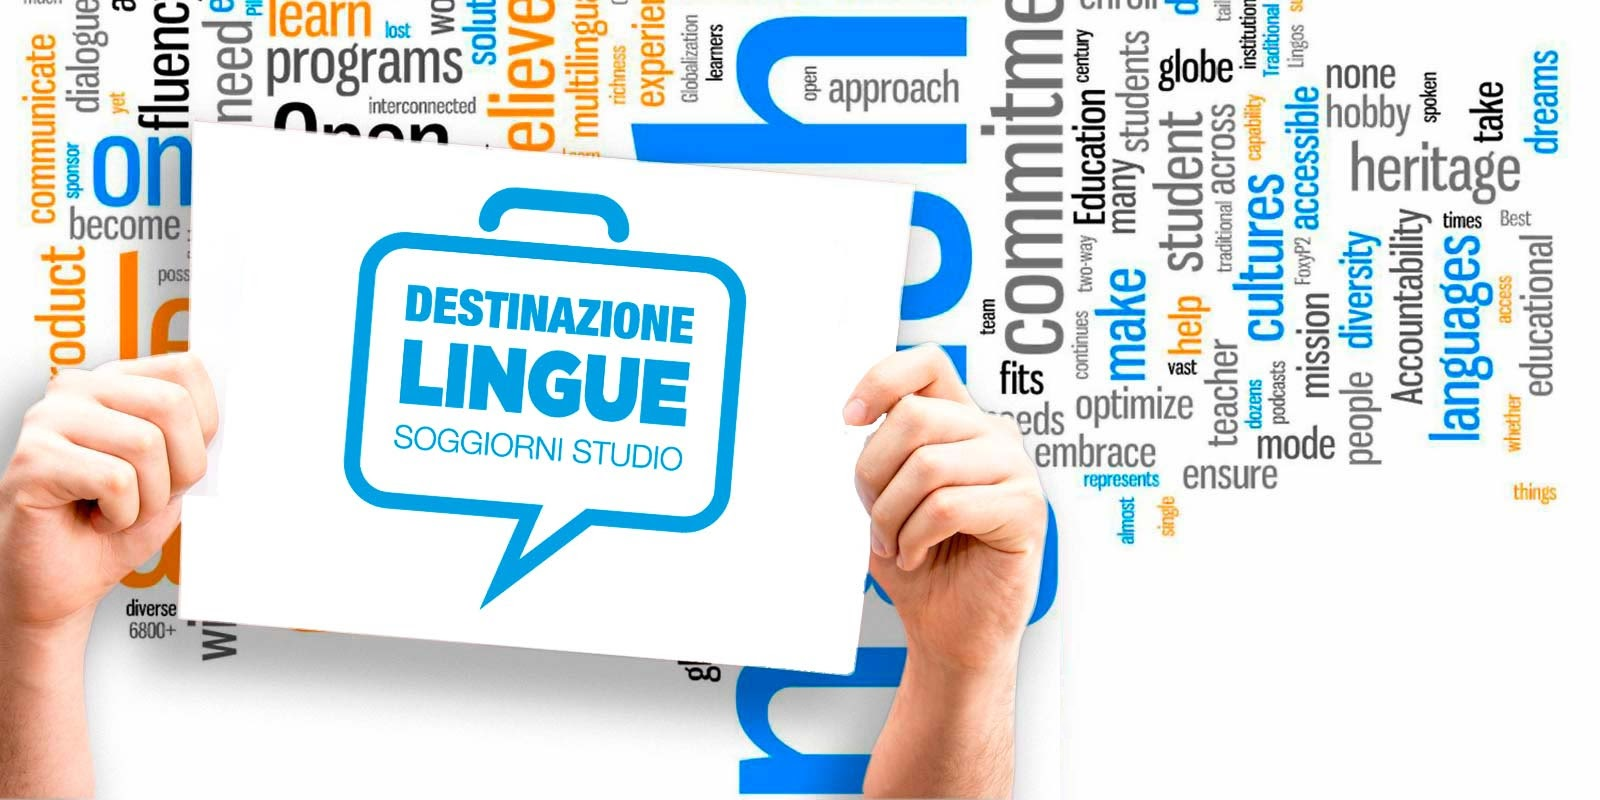 destinazione-lingue